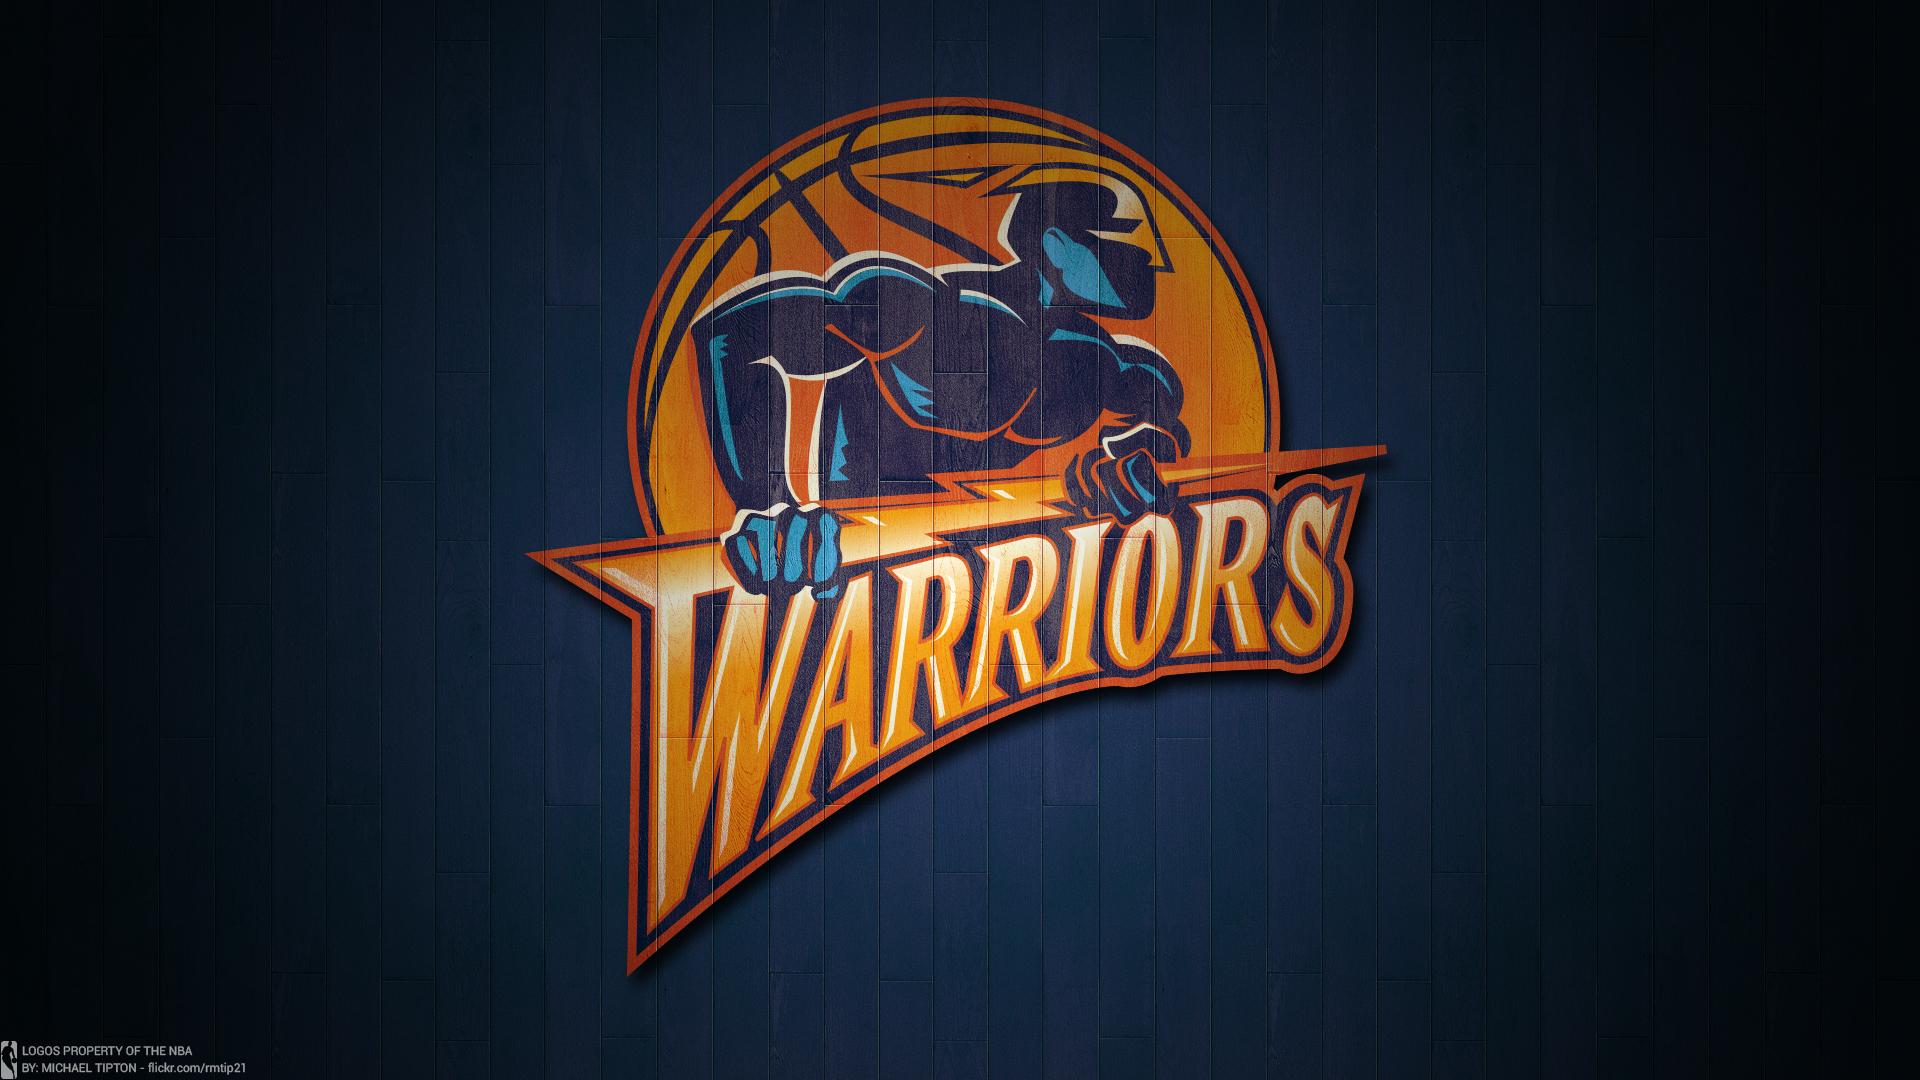 Golden State Warriors Basketball Team Full HD Wallpaper And